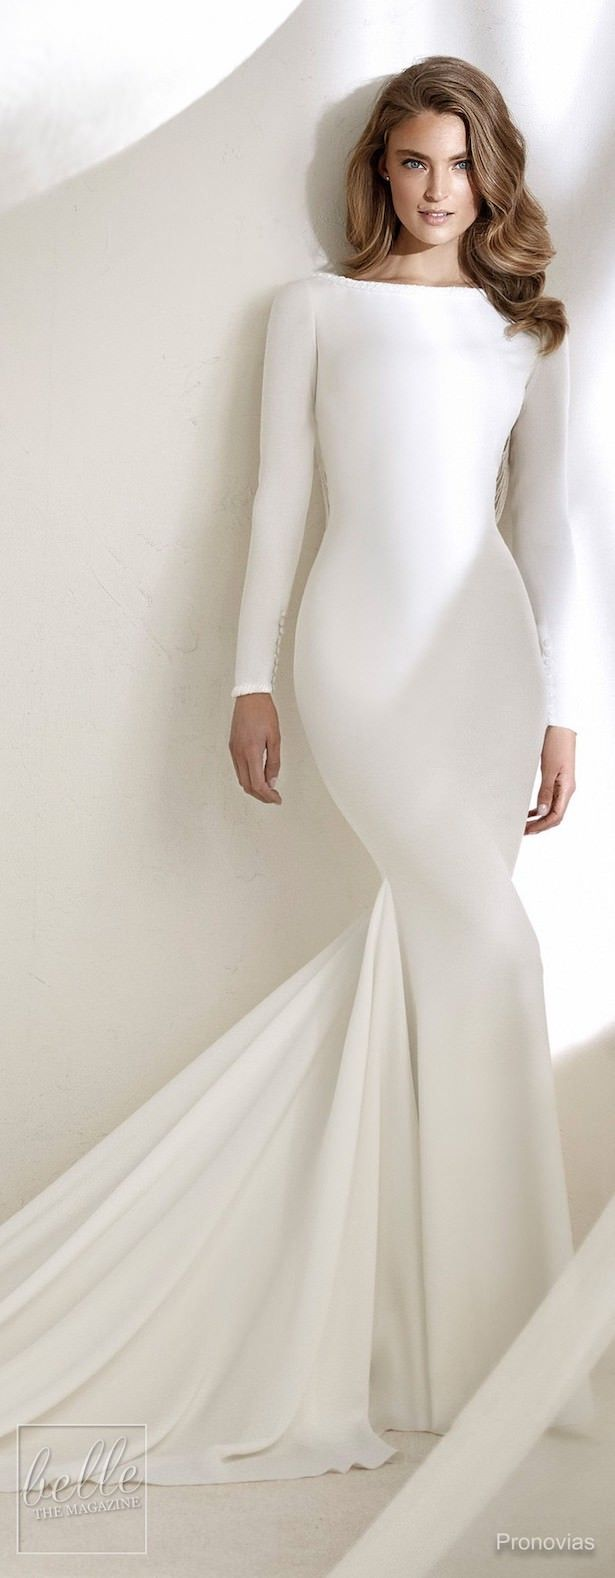 Simple wedding dresses inspired by meghan markle jus wedding